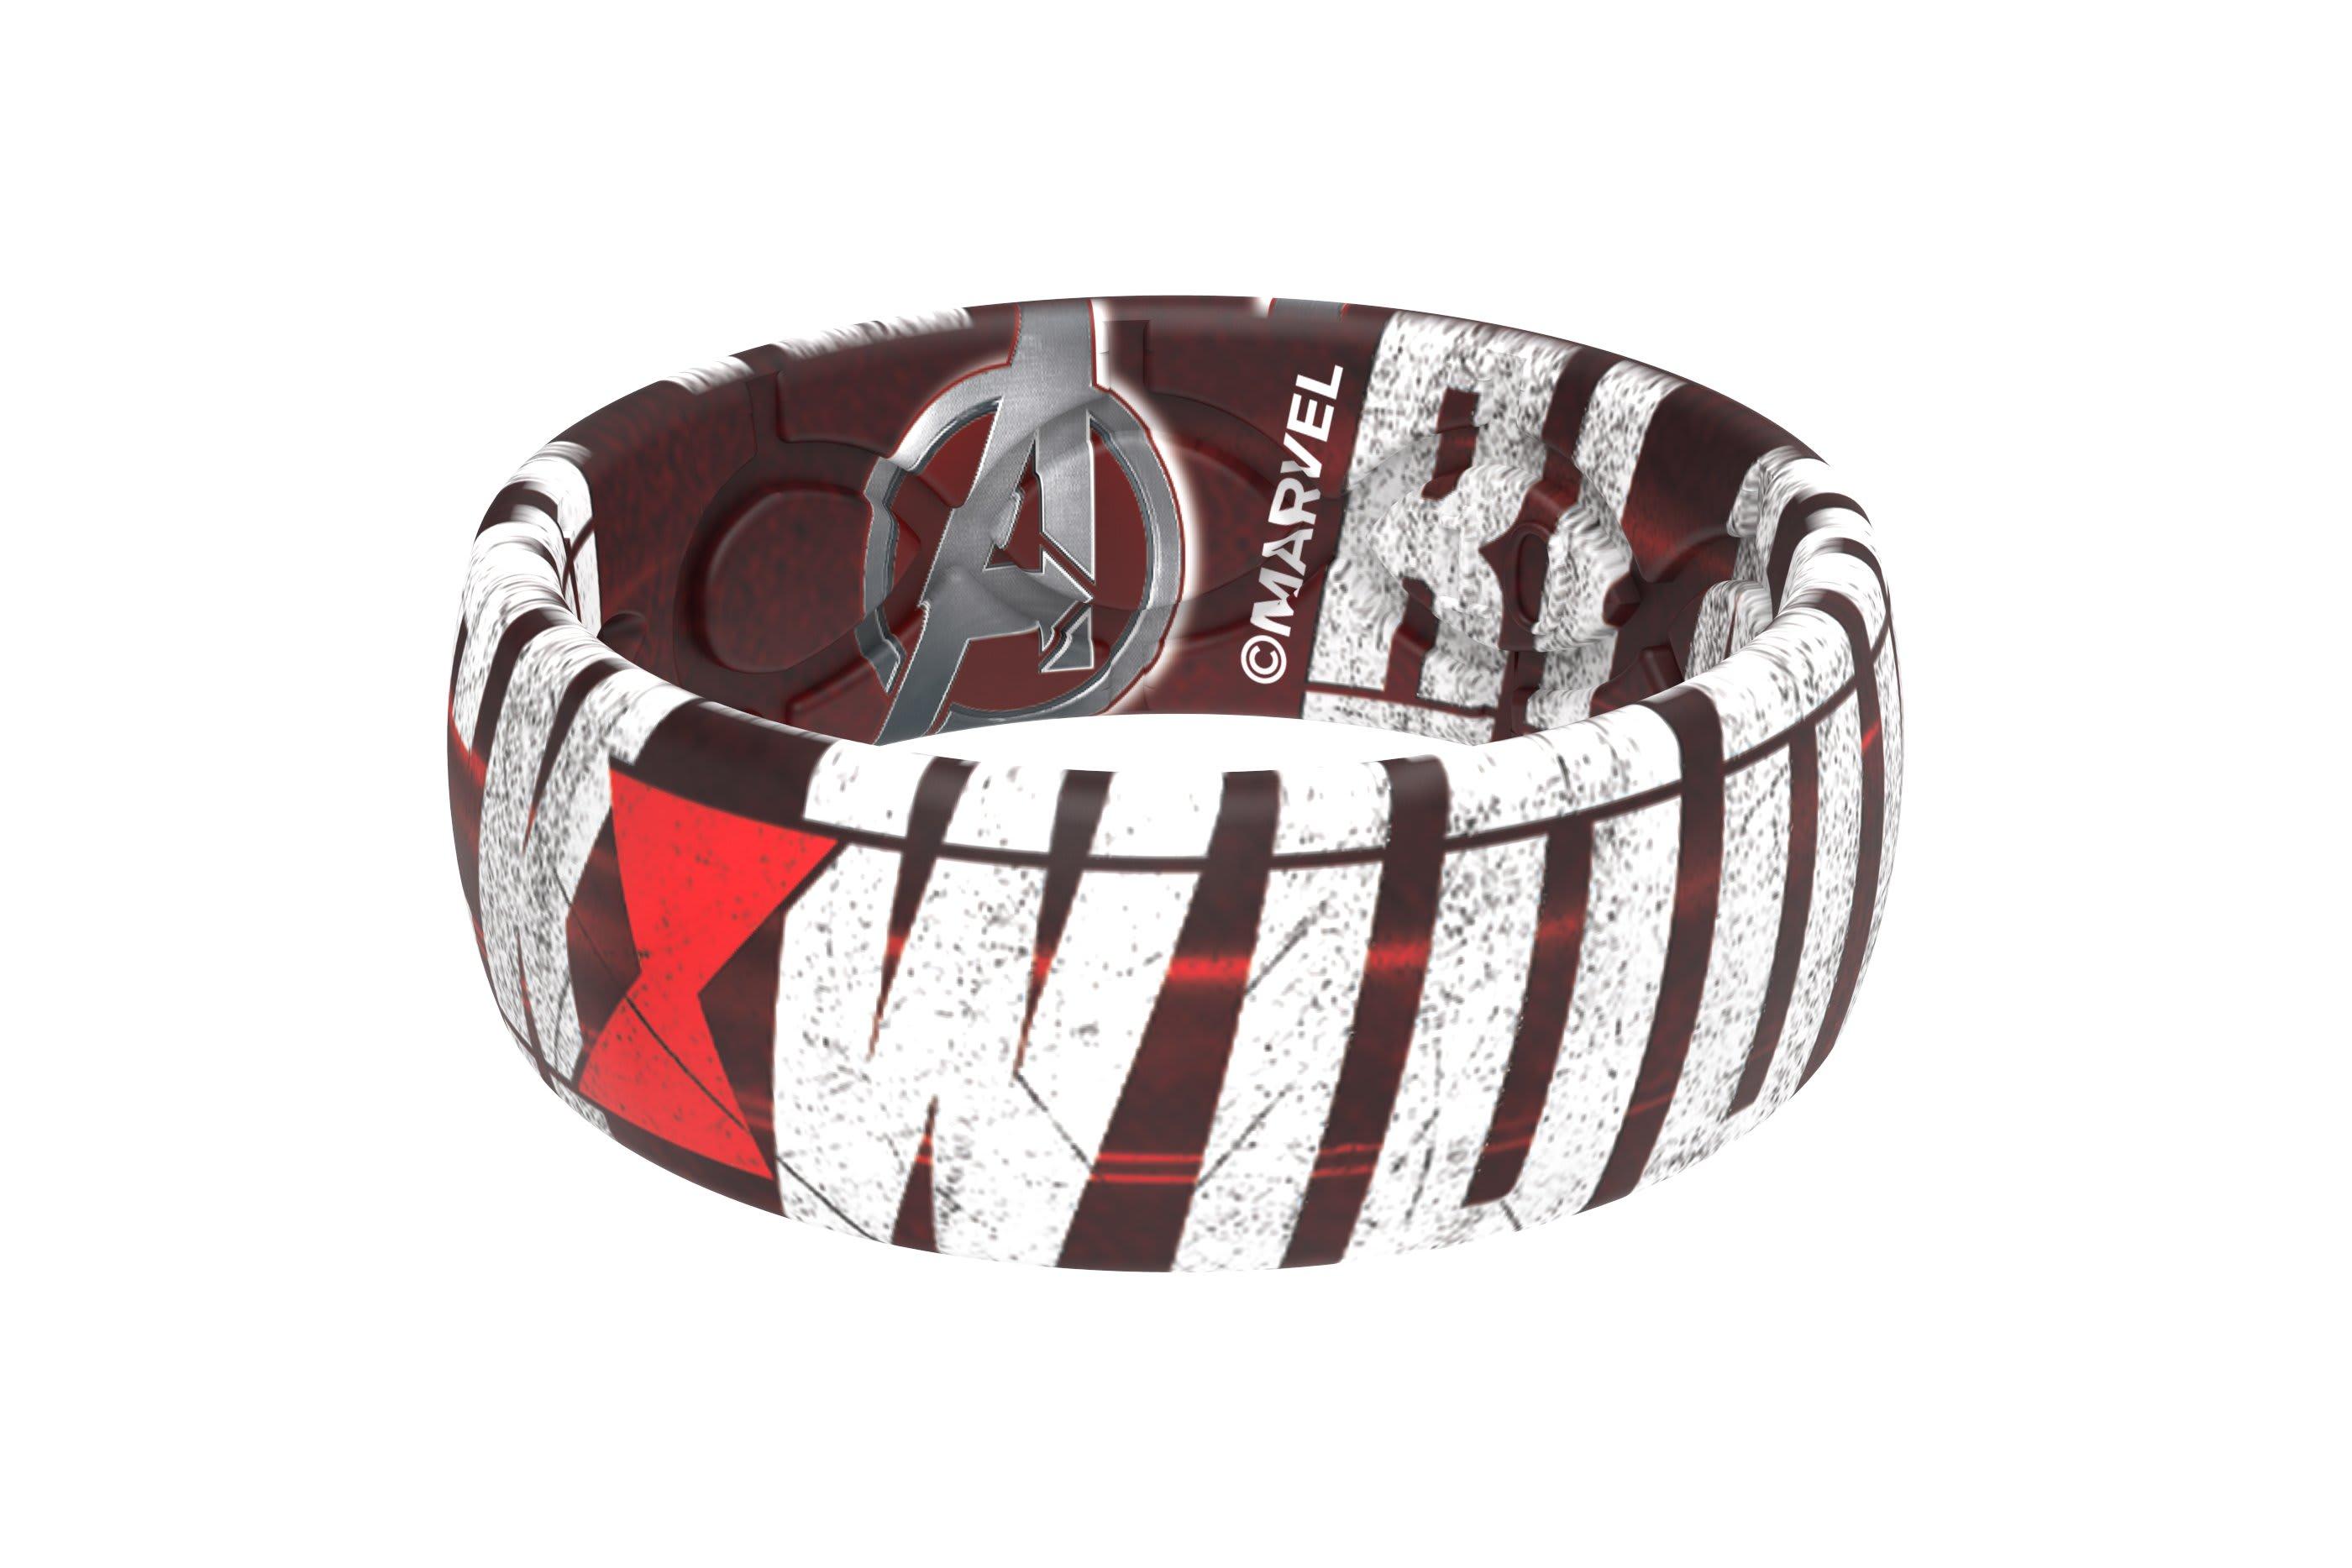 Black Widow - Widow's Bite Ring viewed from side